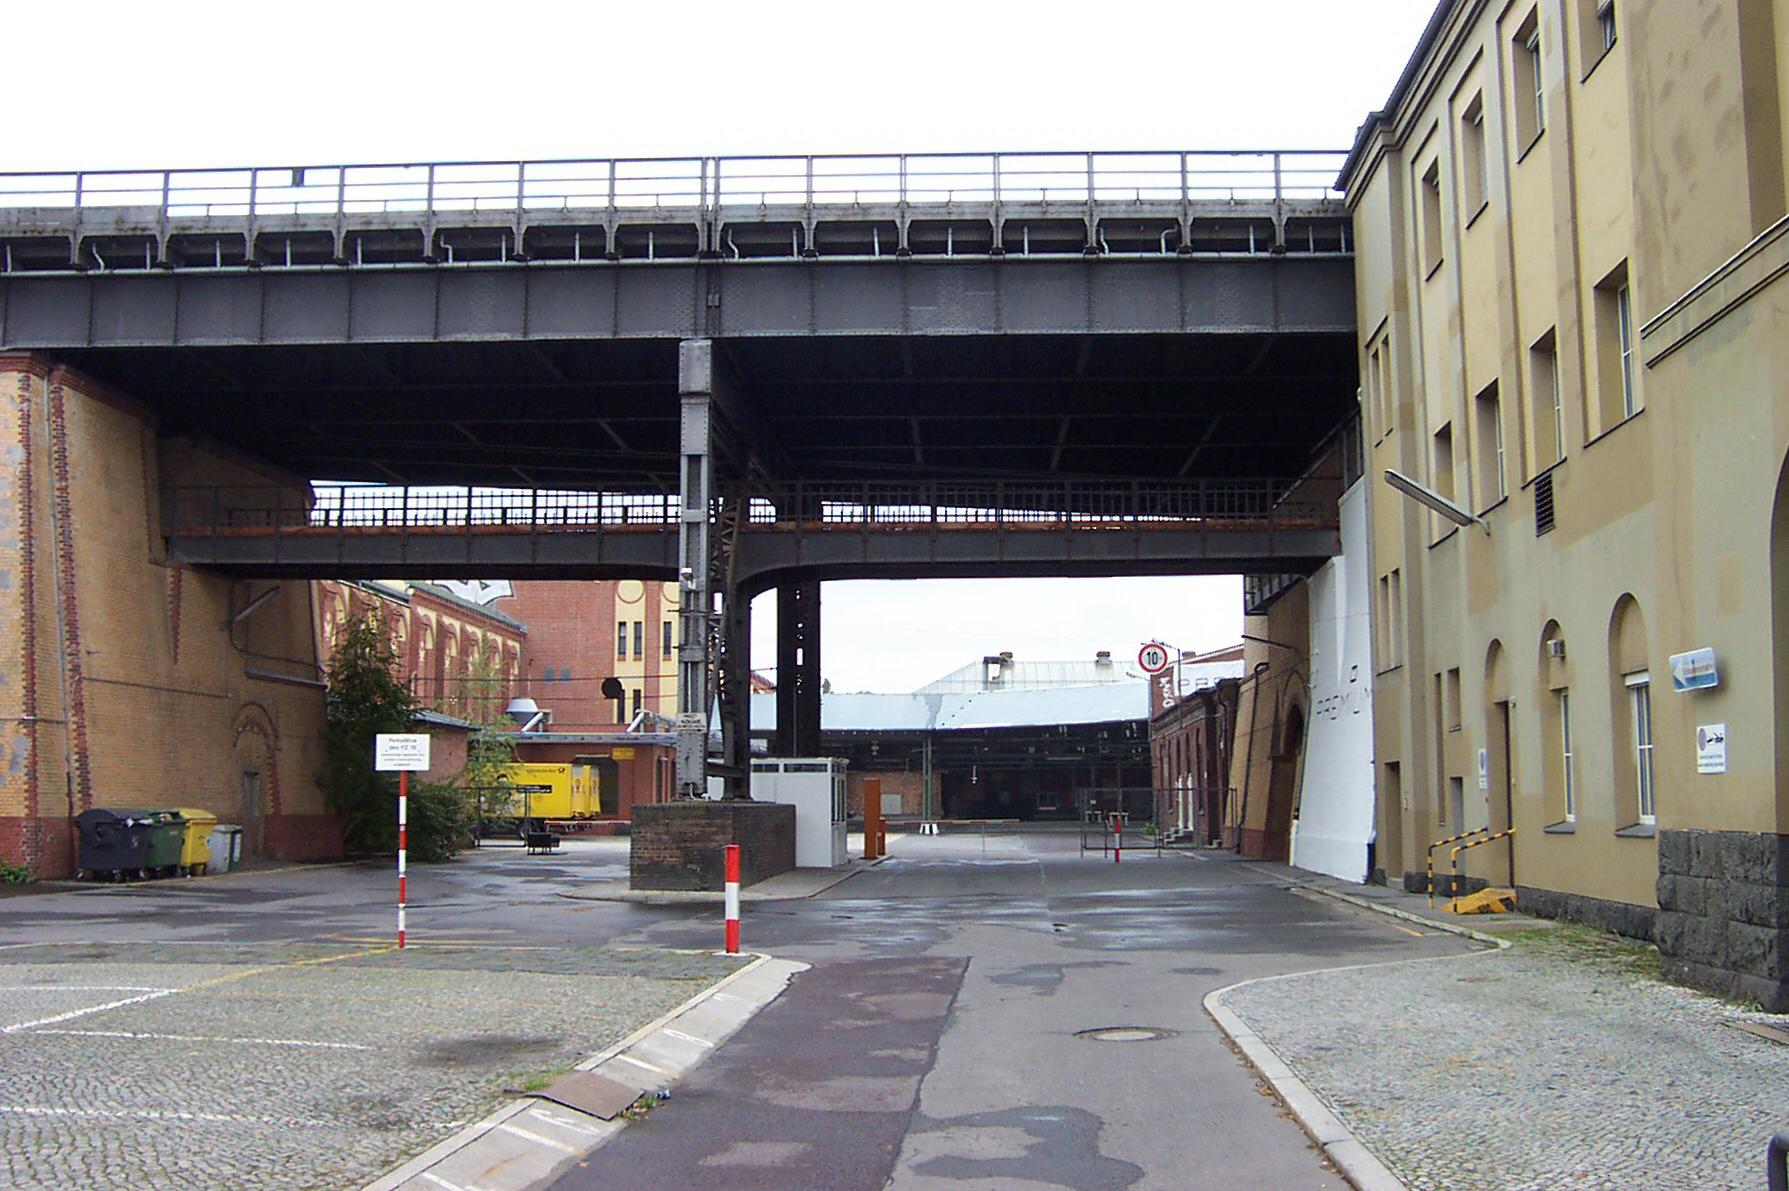 Berlin dresdner bahnhof for Berlin to dresden train